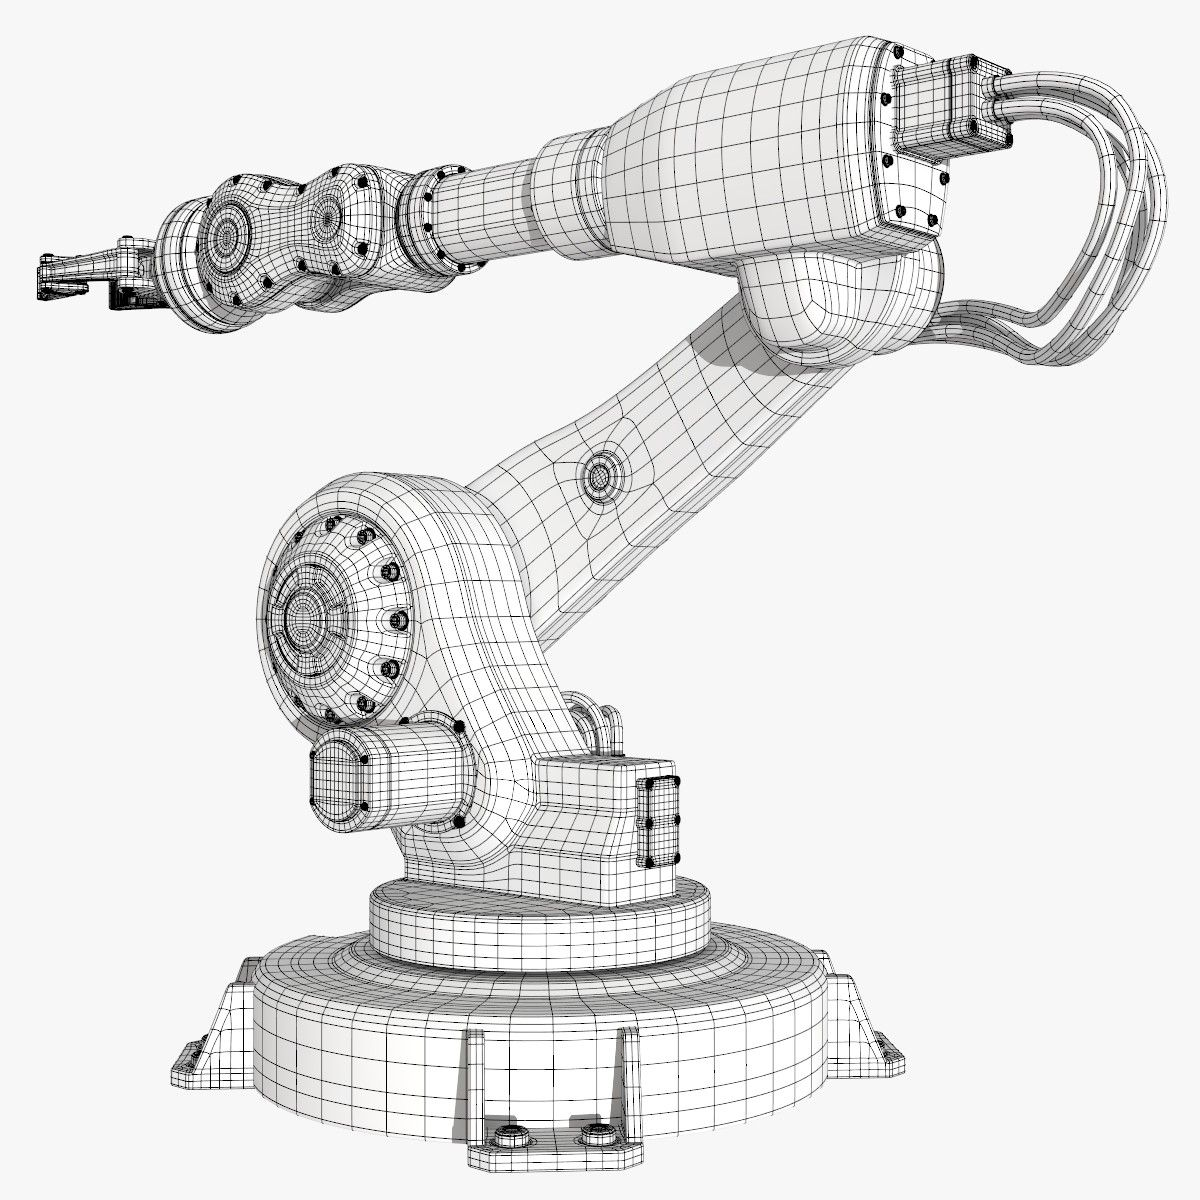 Intec Kuka Industries Spezialist F252r Alle Prozesse Thu